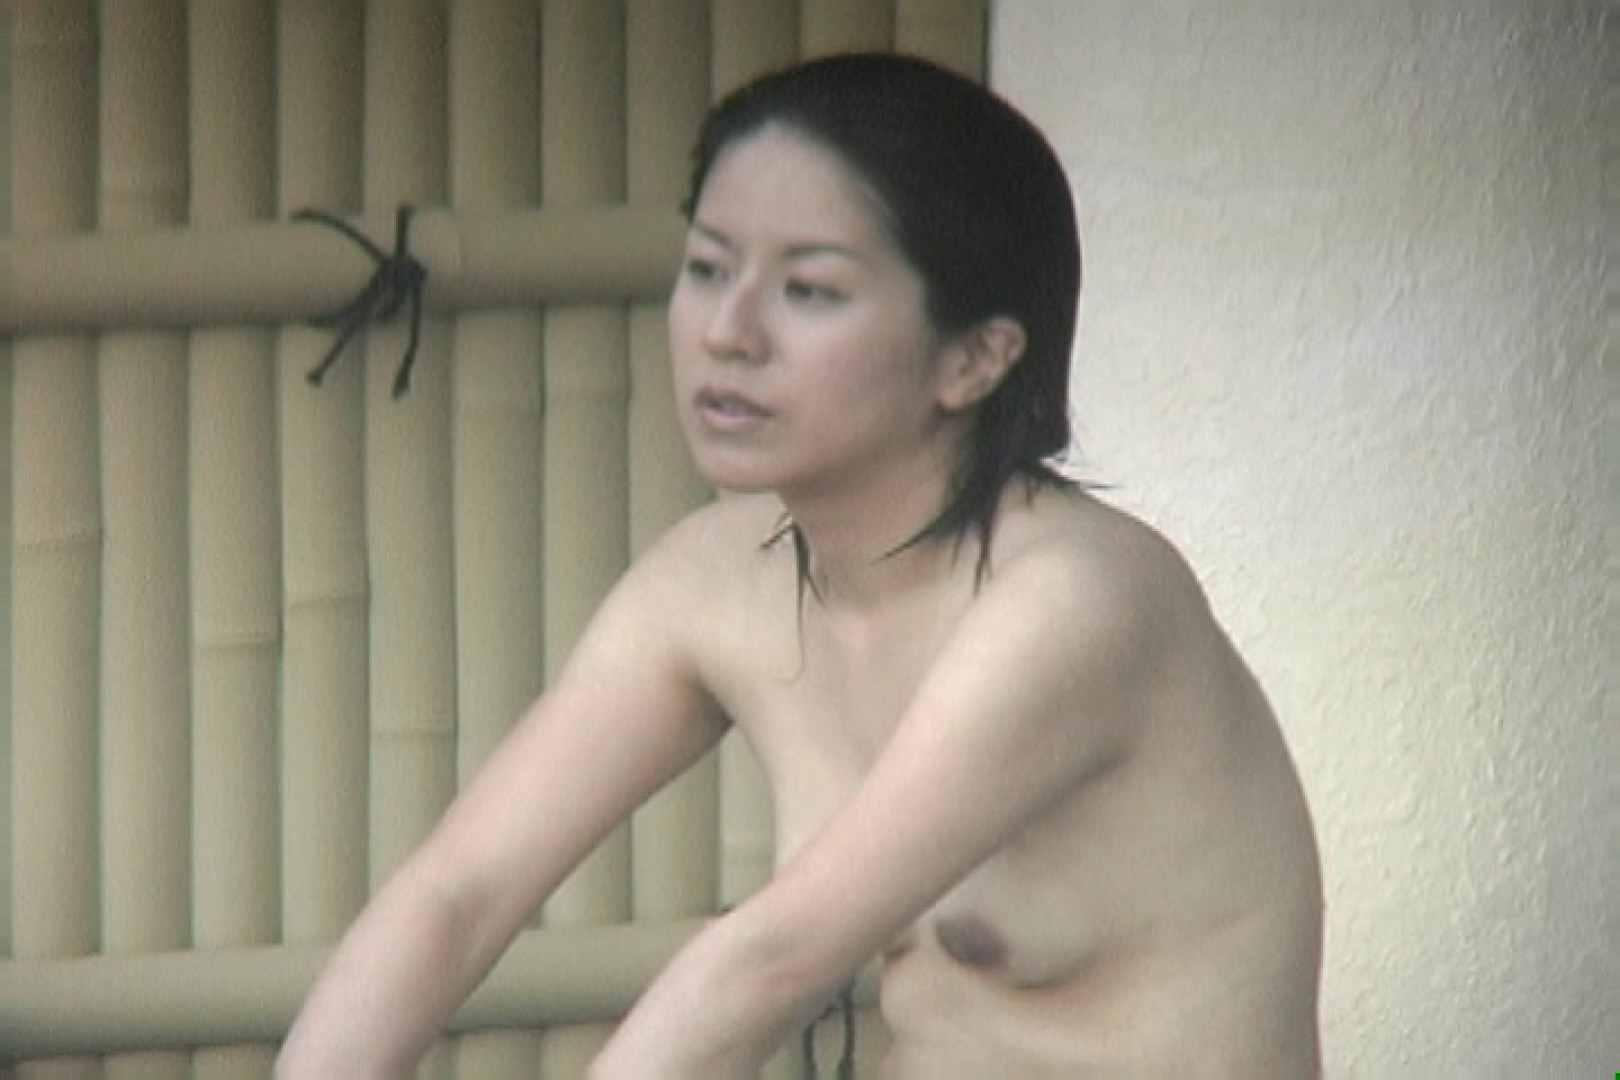 Aquaな露天風呂Vol.694 露天 オメコ無修正動画無料 110PICs 20